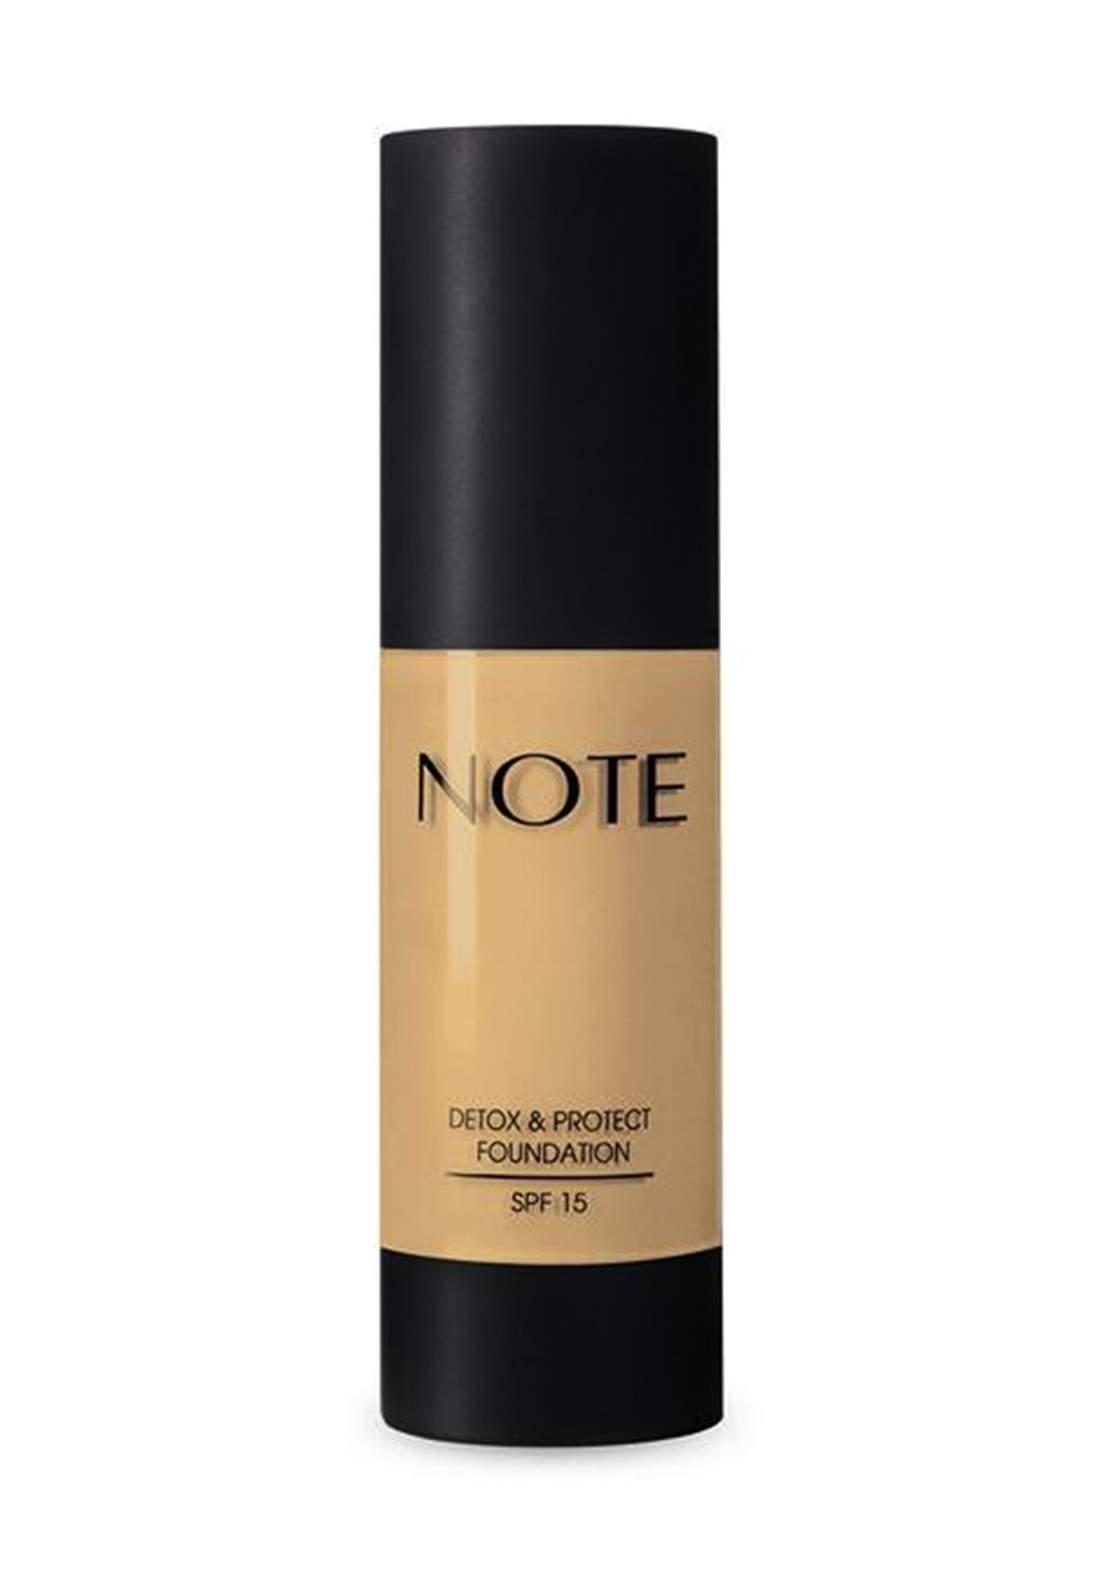 Note Detox And Protect Foundation 35 ml No.02 كريم اساس